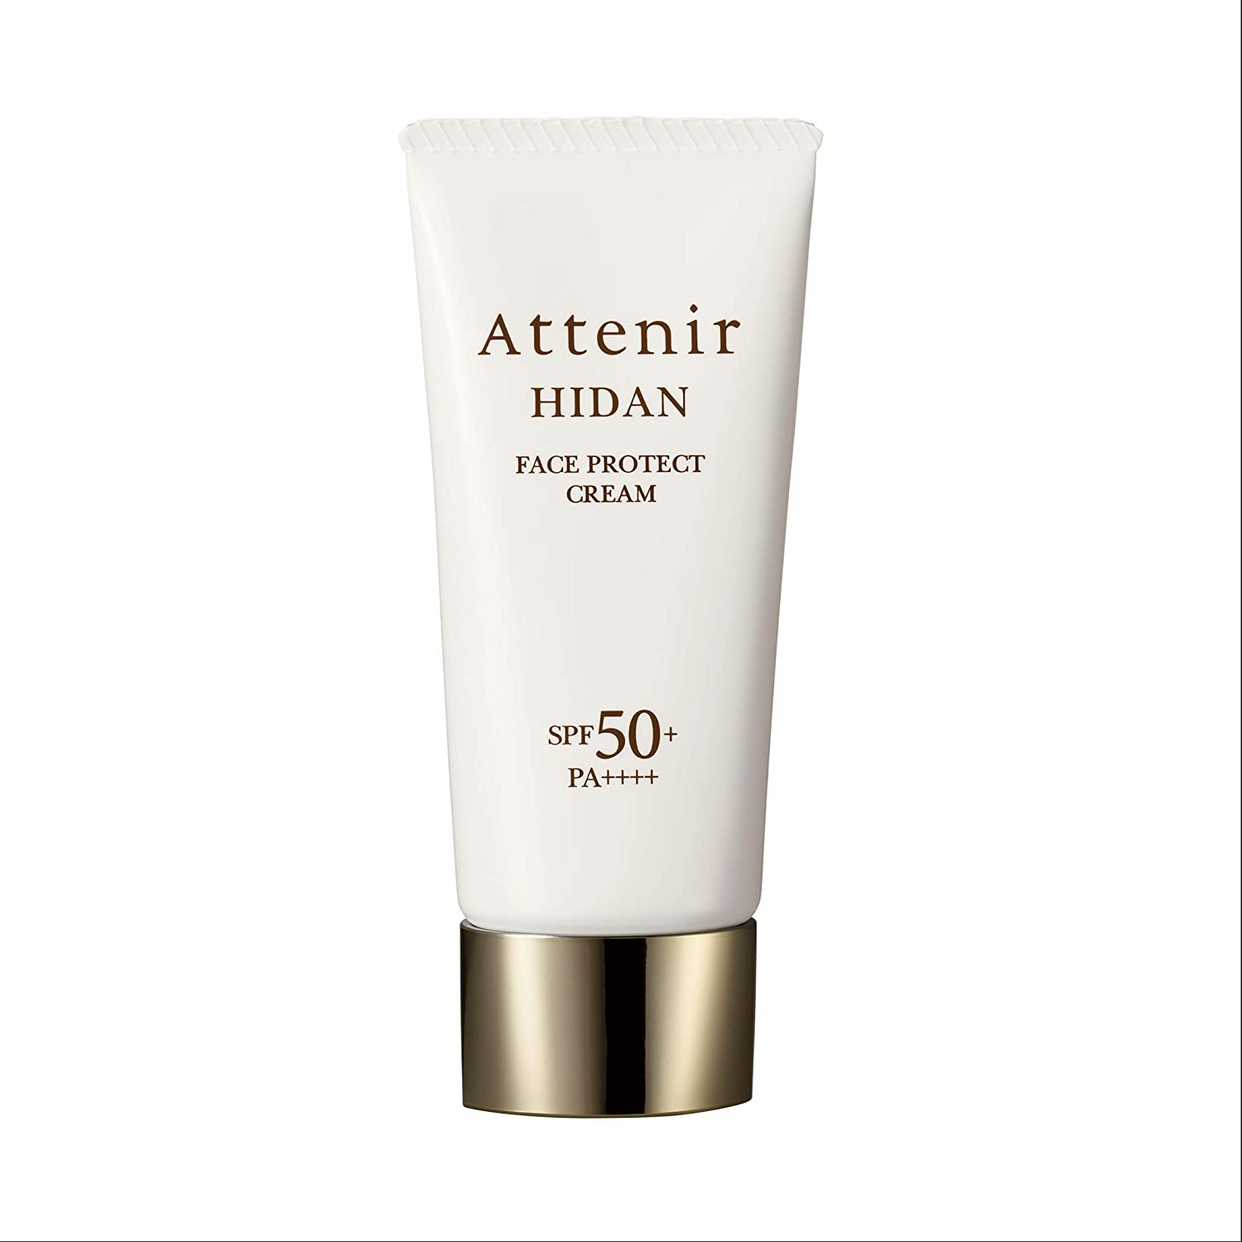 Attenir(アテニア) 陽断UV50 フェイスプロテクトクリームの商品画像